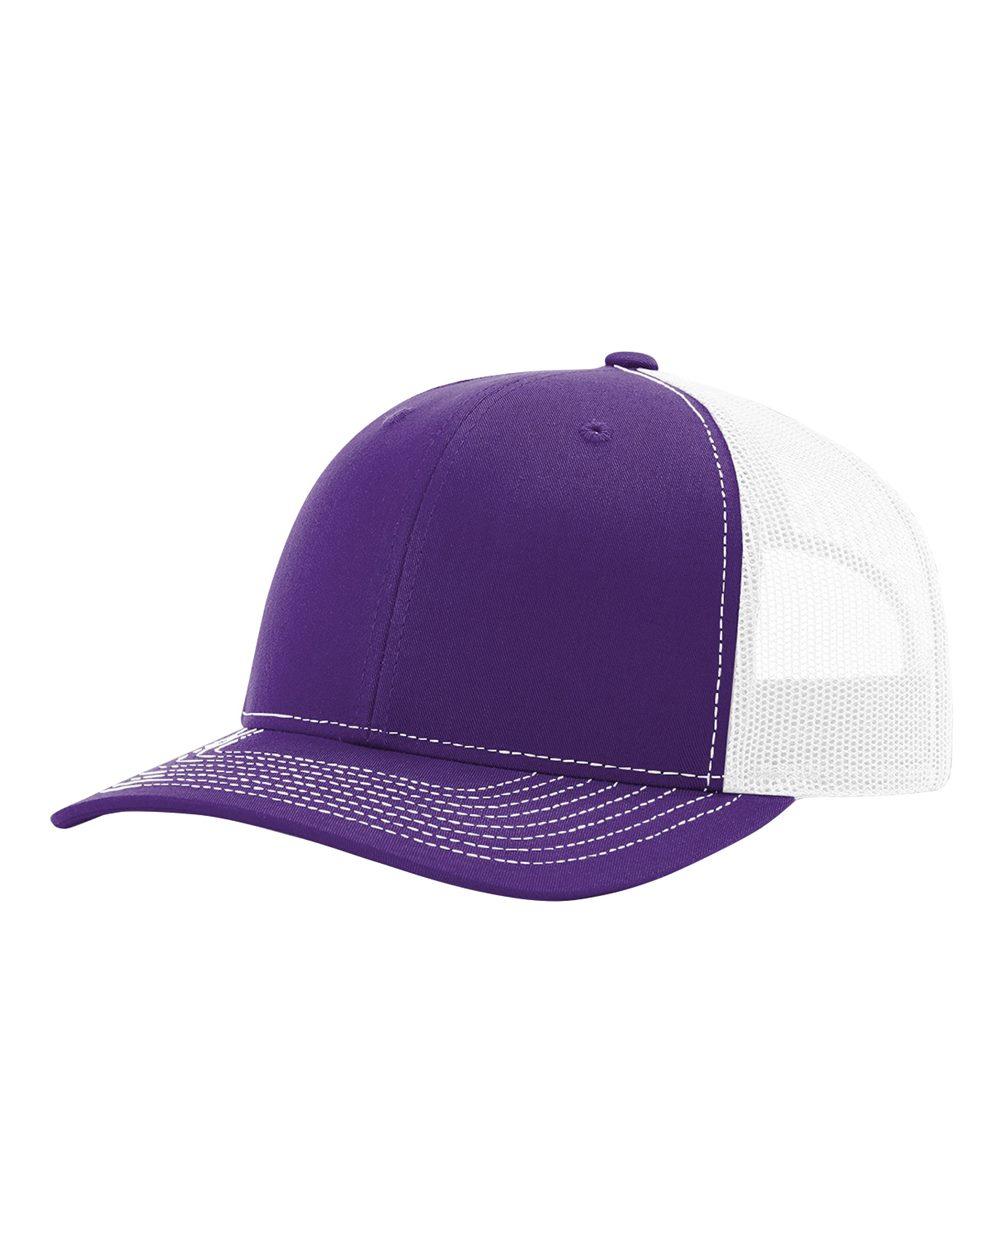 click to view Purple/ White